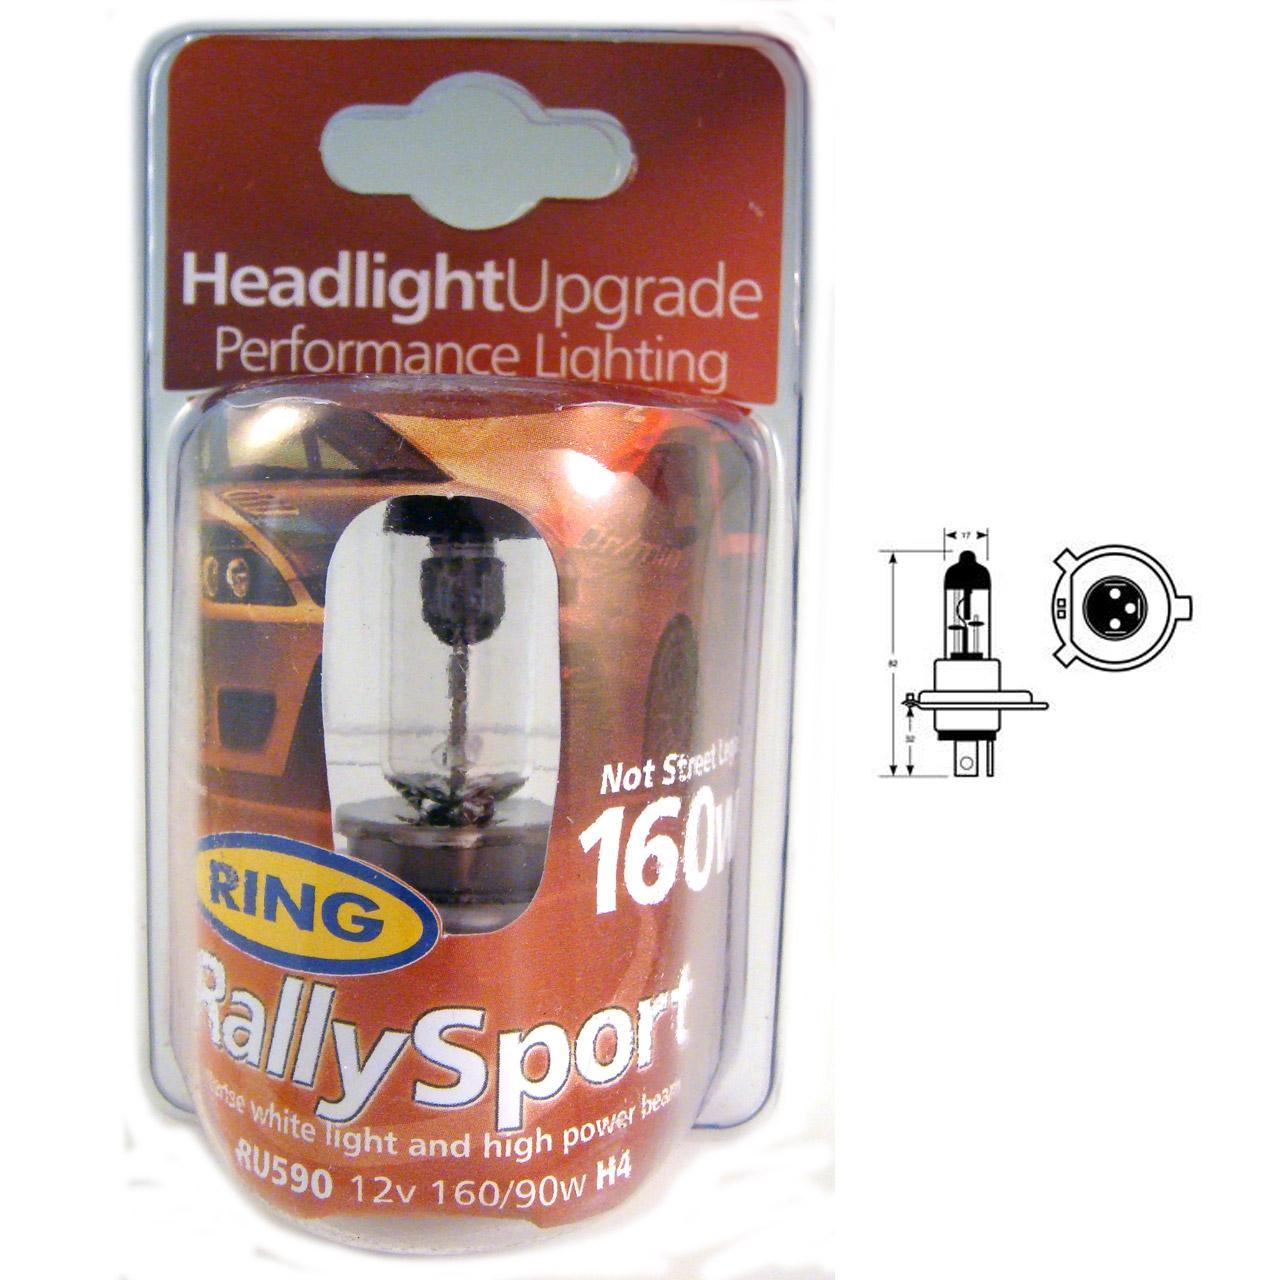 ring 1 ampoule rallysport h4 12v 160 100w p43t 15616. Black Bedroom Furniture Sets. Home Design Ideas